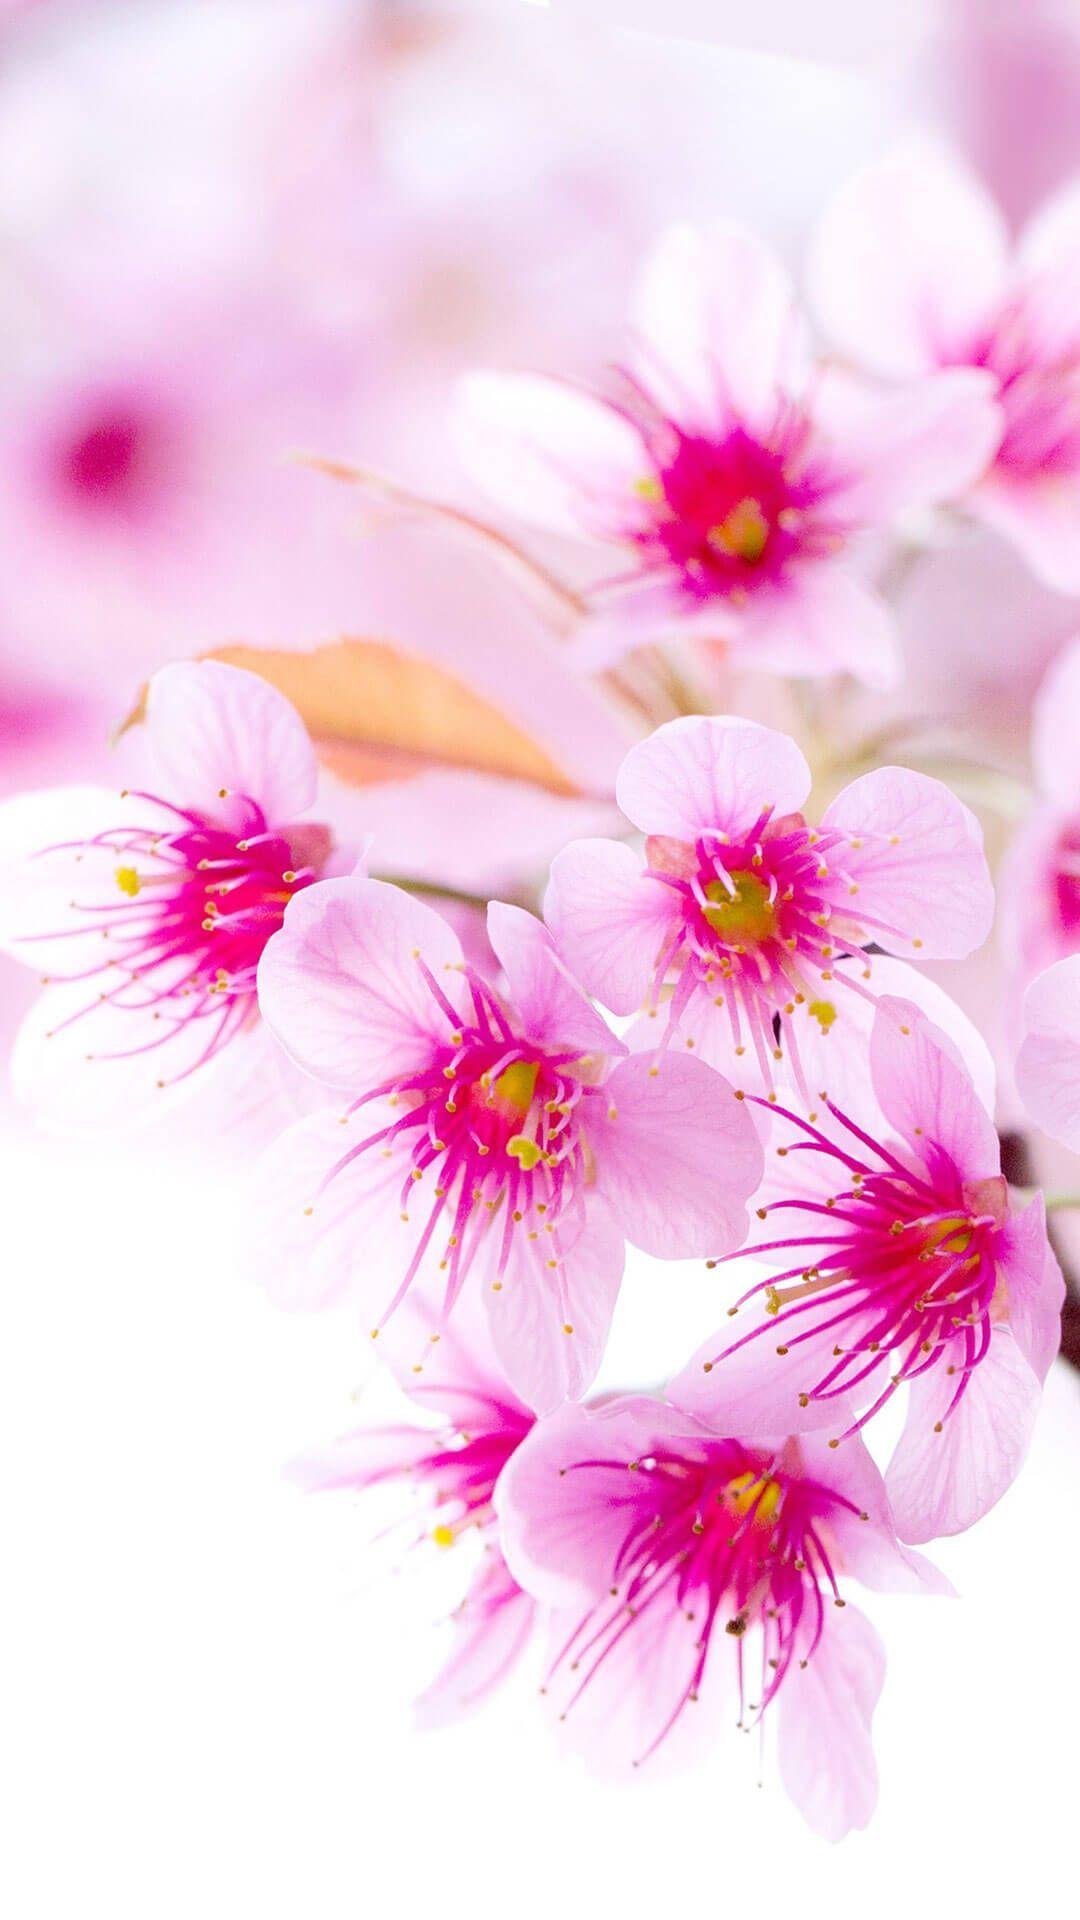 9 Amazing Cherry Blossom Iphone Wallpaper 4K in 2020